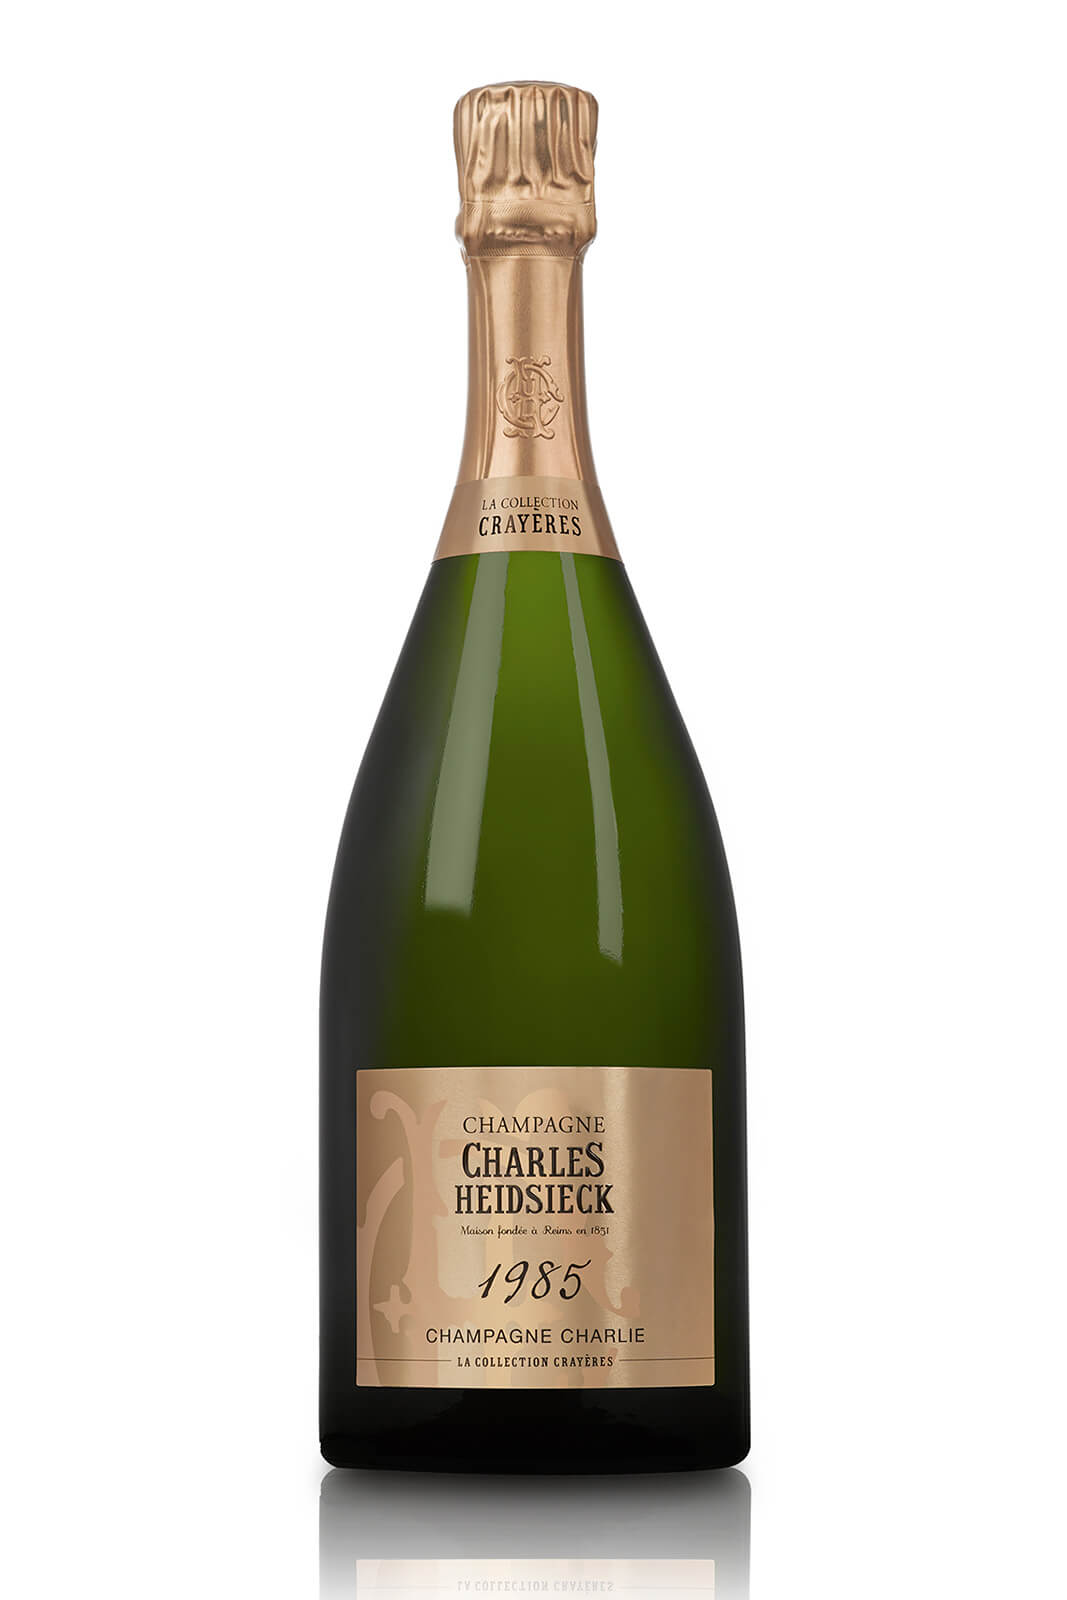 Charles Heidsieck Champagne Charlie 1985